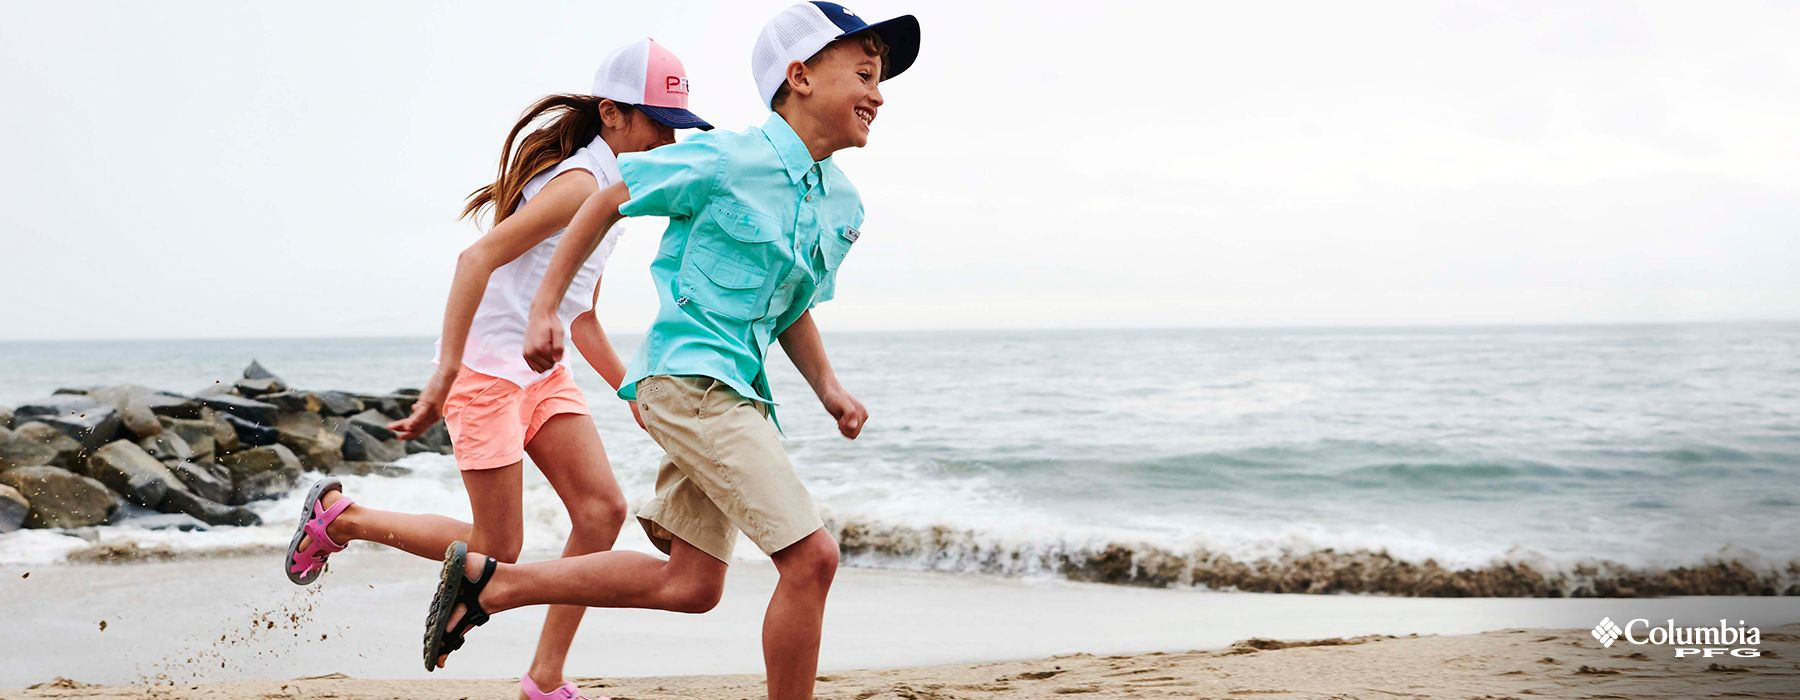 columbia-kids.jpg